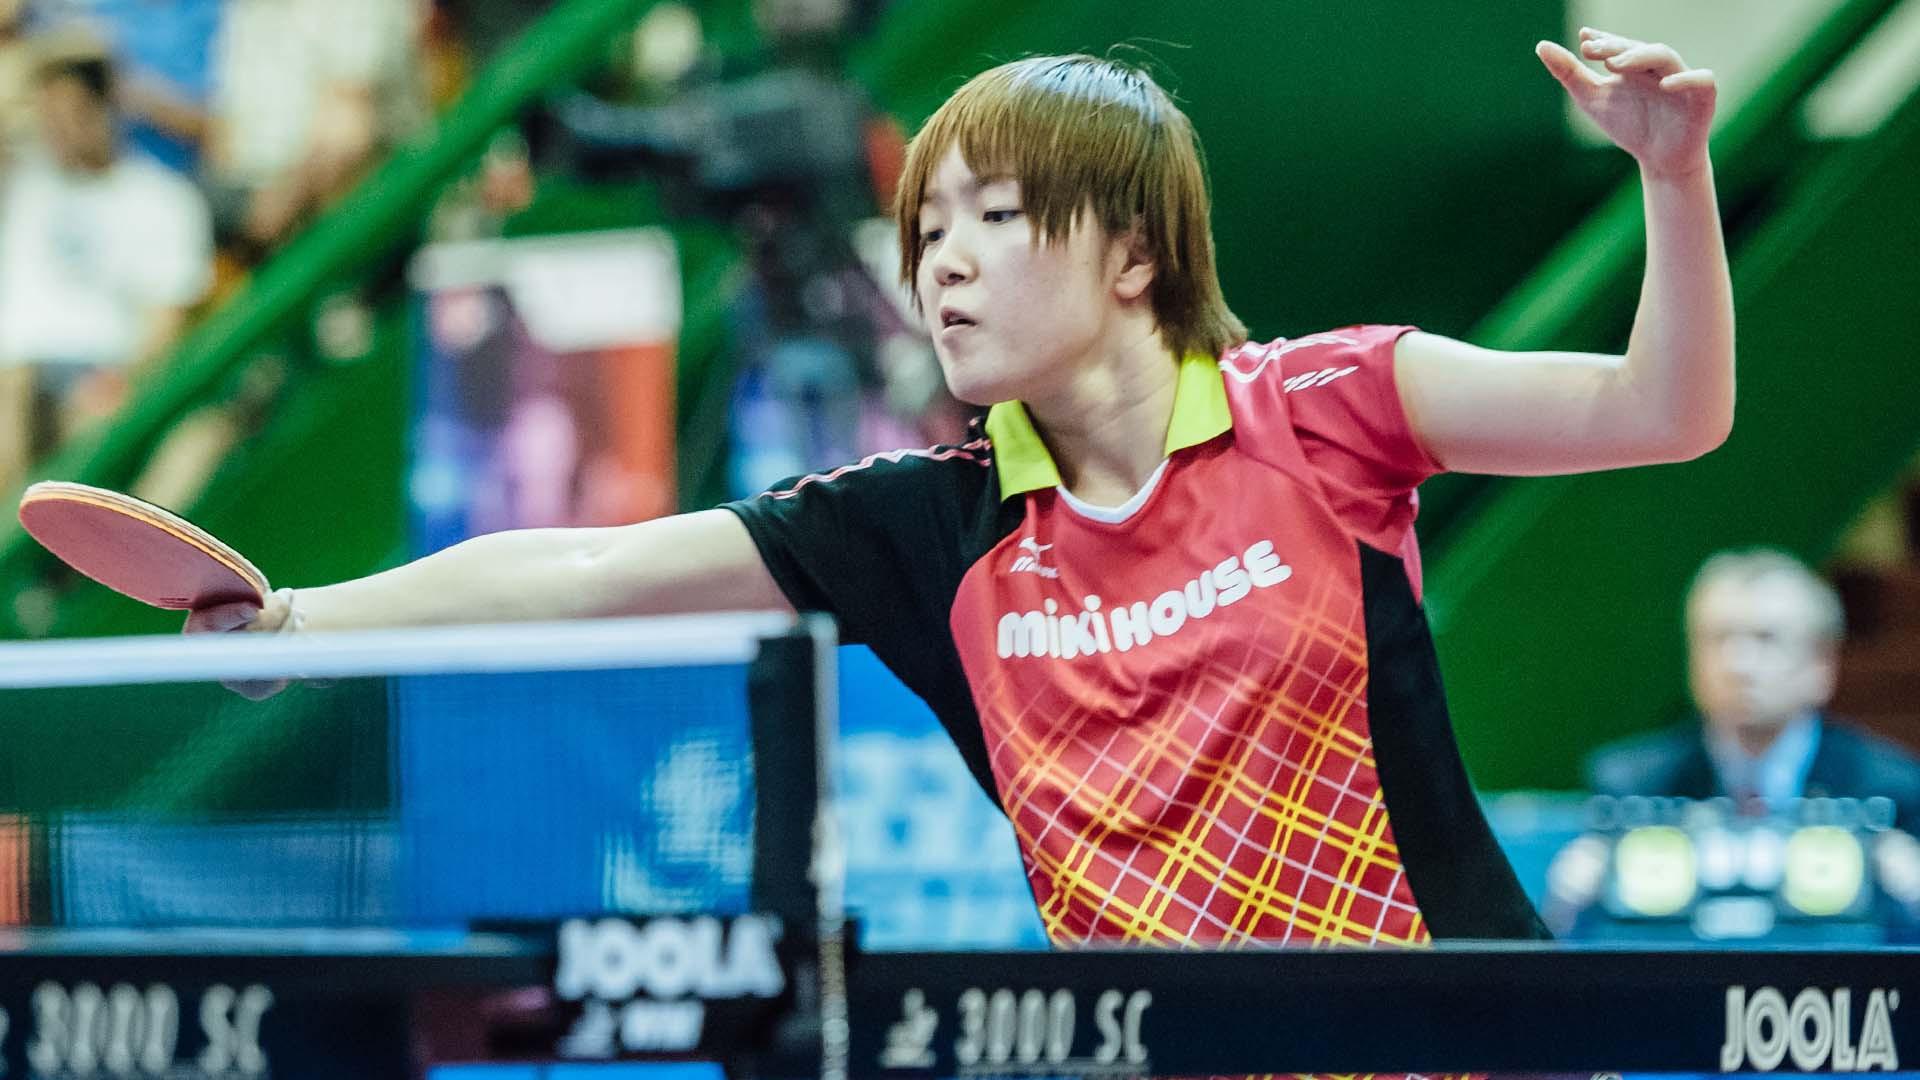 Shibata beats top seed Zhu on way to semi-finals at ITTF China Open